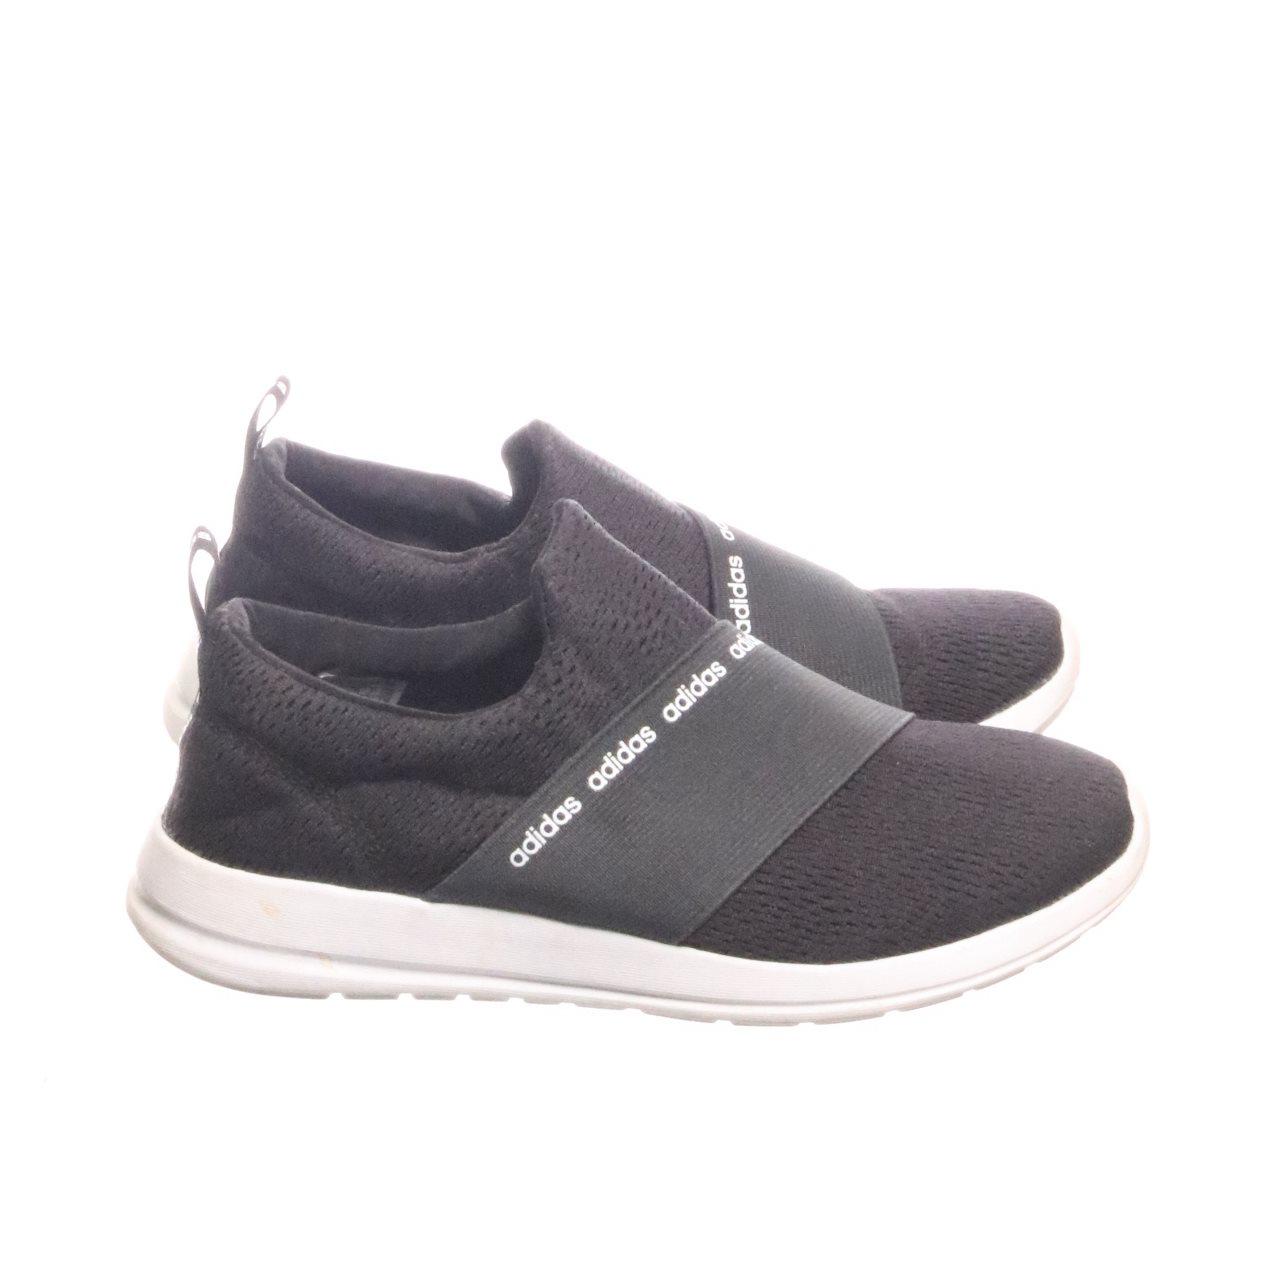 new product 6941d 81554 coupon code for adidas neo sneakers strl 38 svart vit de57a 9fb55